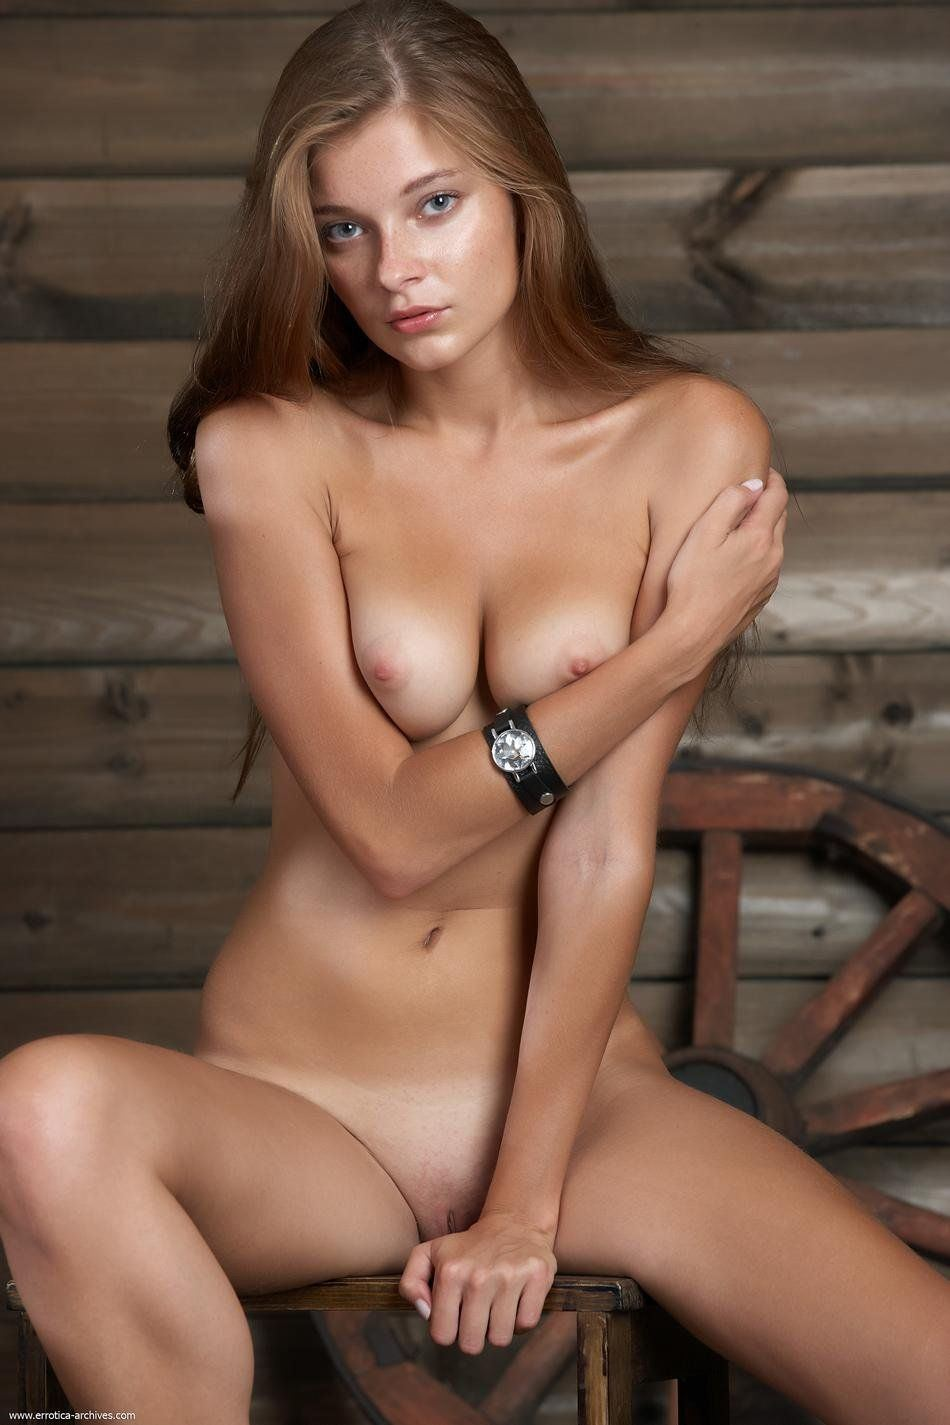 Indiana Evans Naked